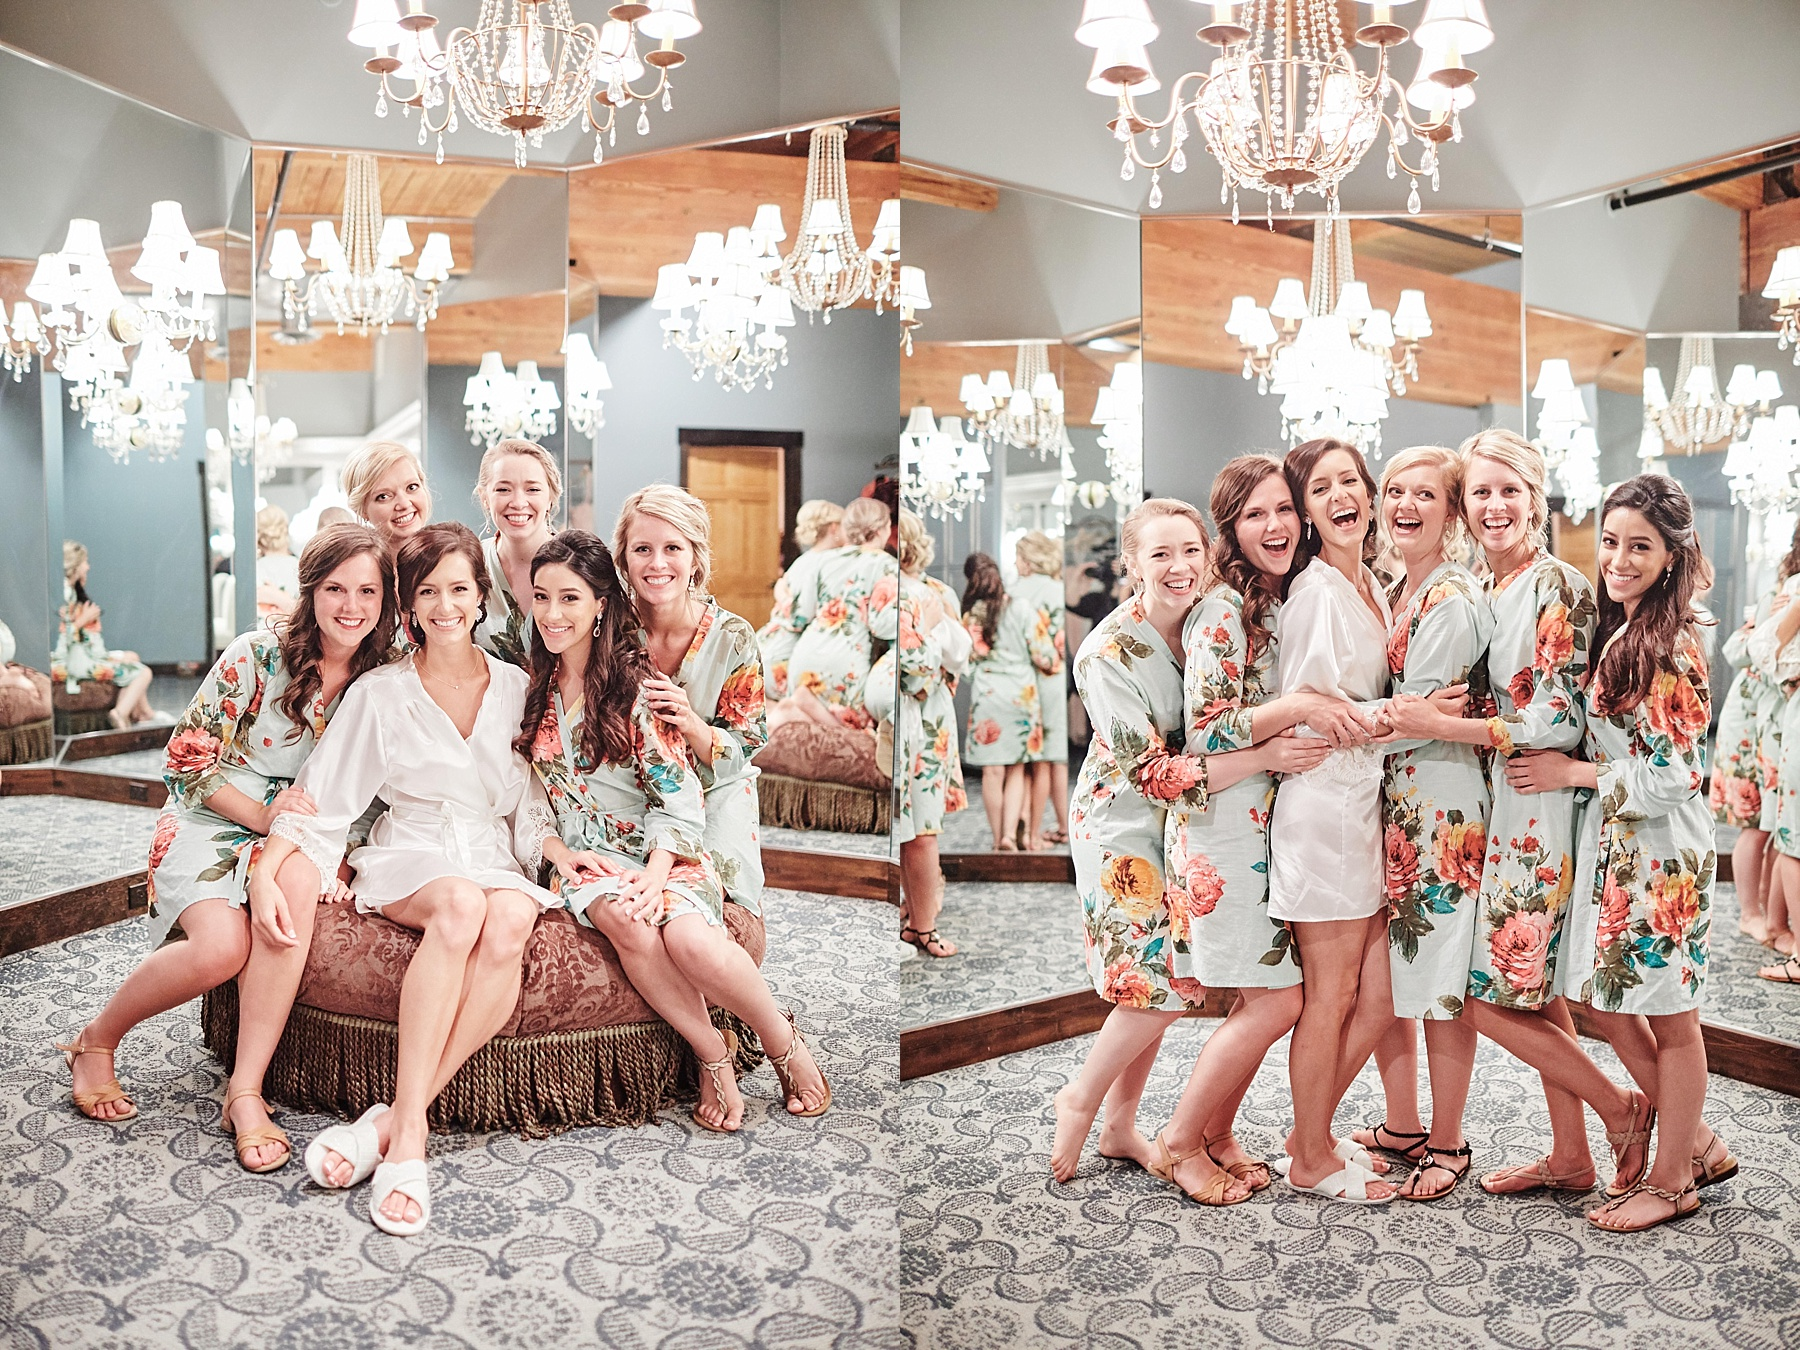 ABULAE-Wedding-Saint-paul-MN-Josh-Sofia-Wedding-Mears-Park_0723.jpg